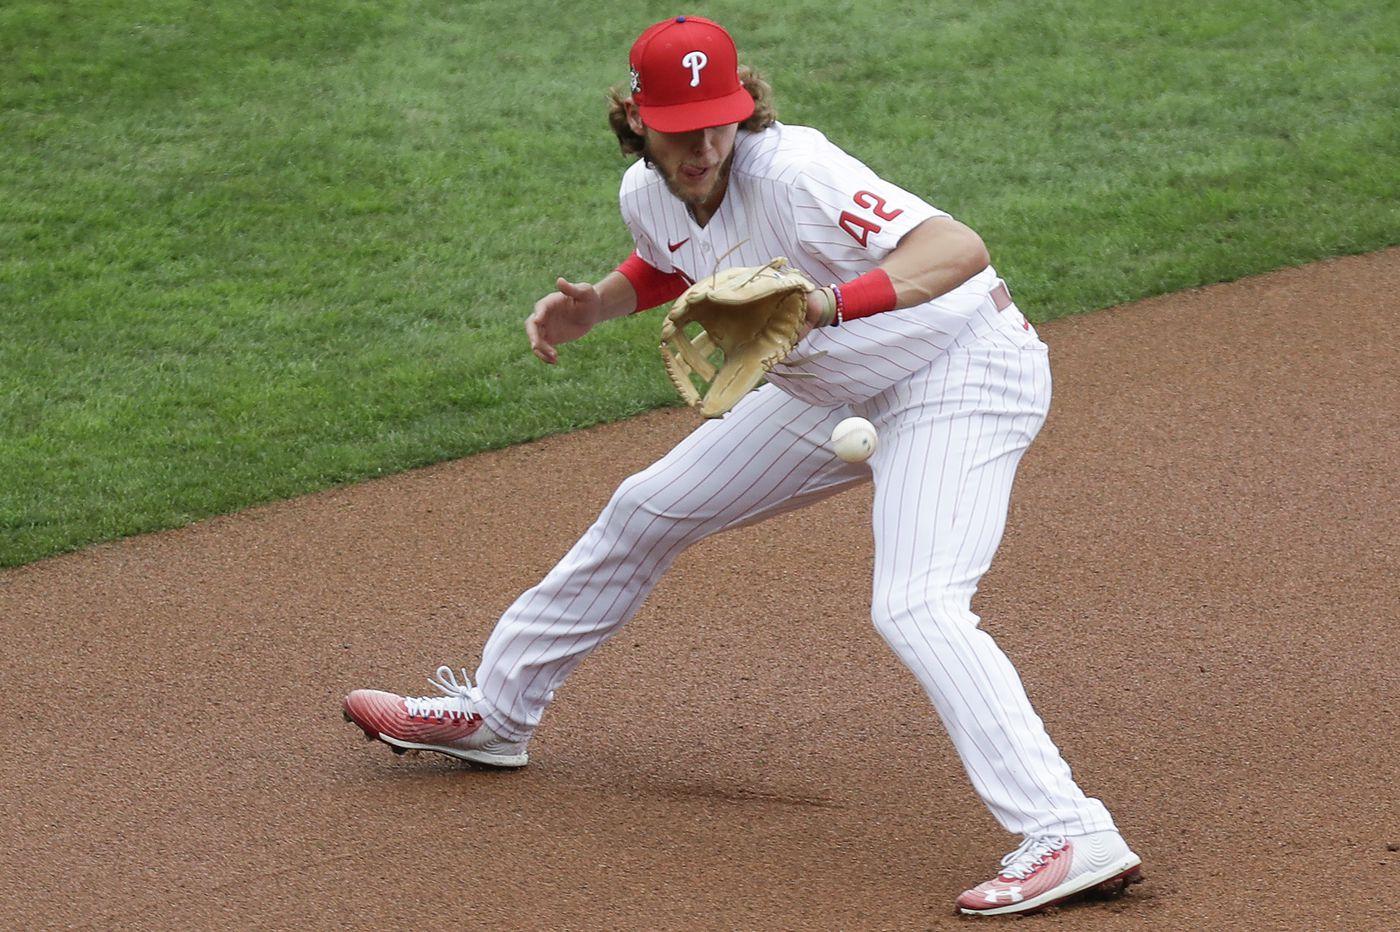 Phillies rookie third baseman Alec Bohm earning praise for defensive improvement